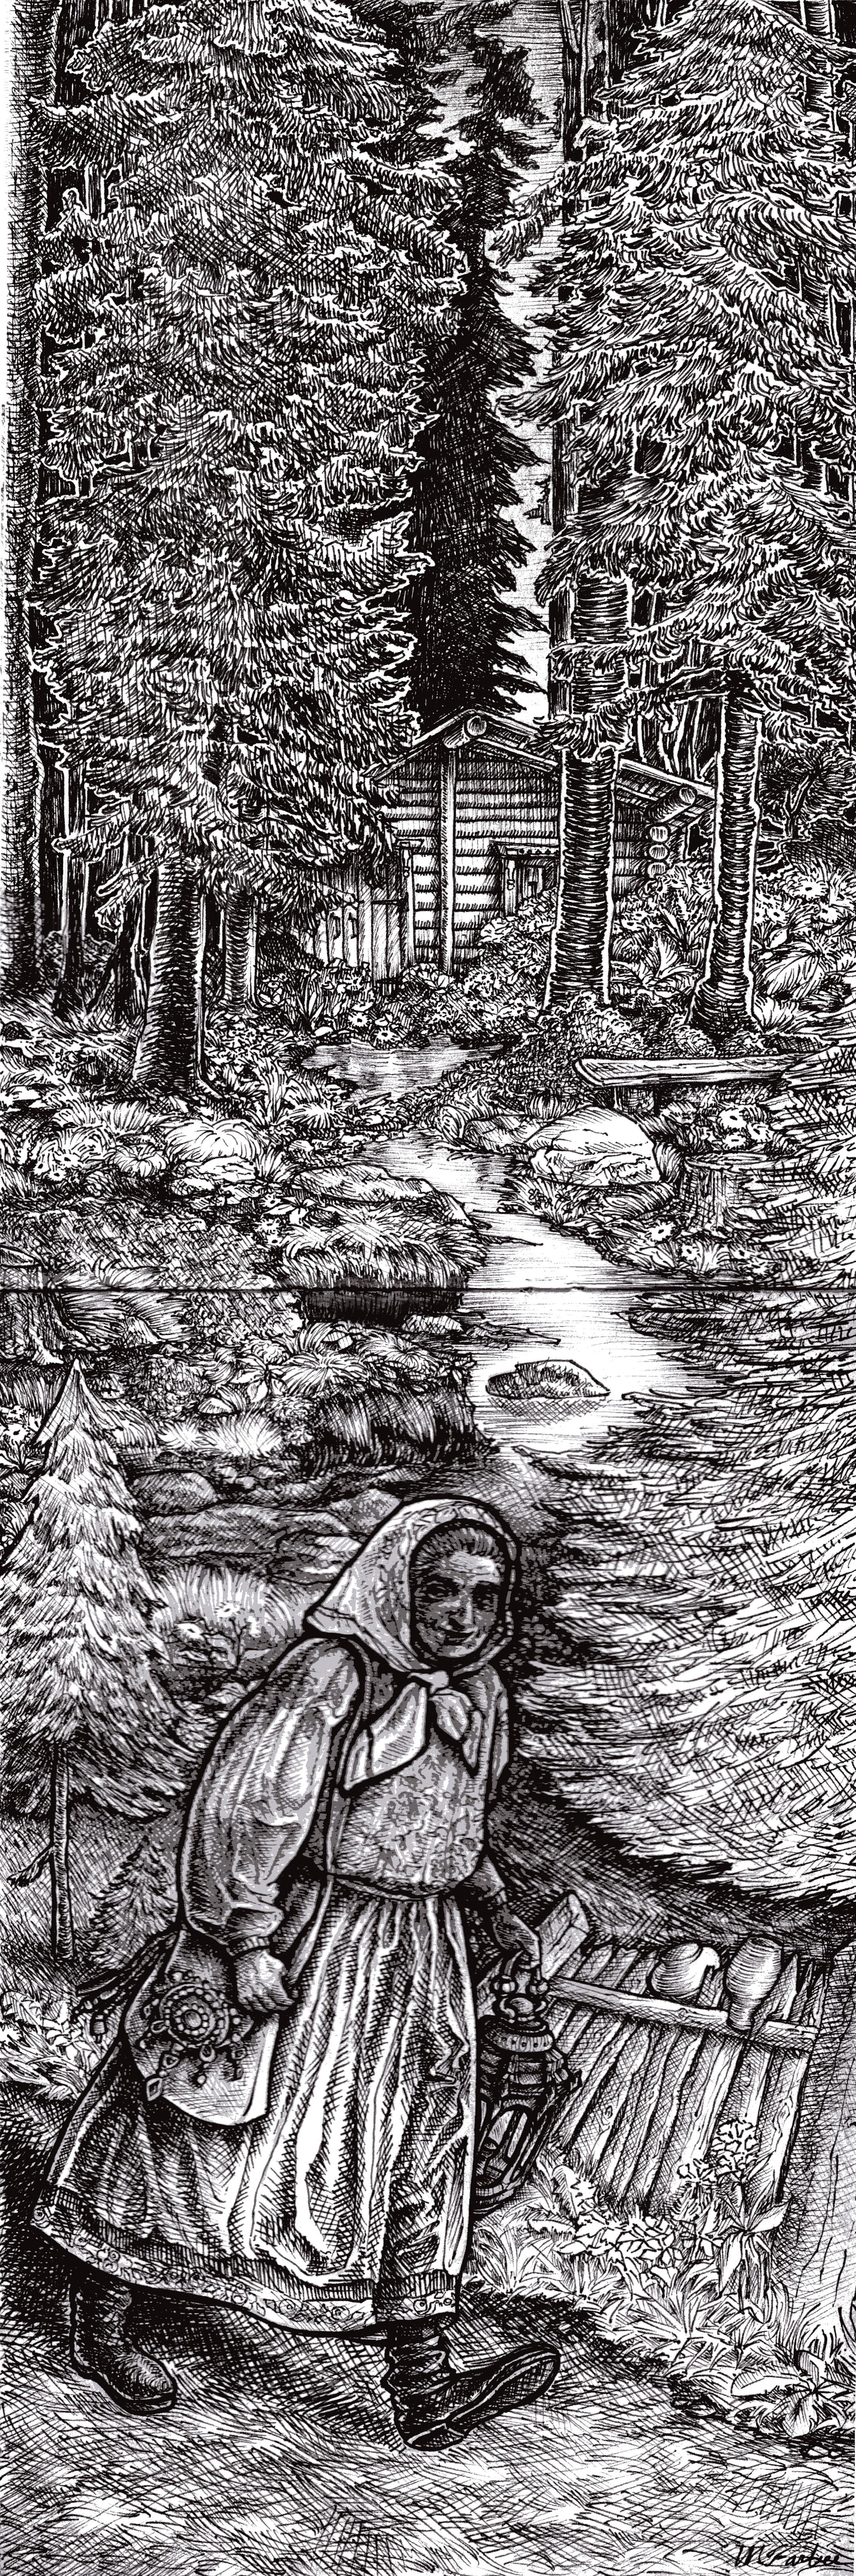 Stitched Page 1.JPG